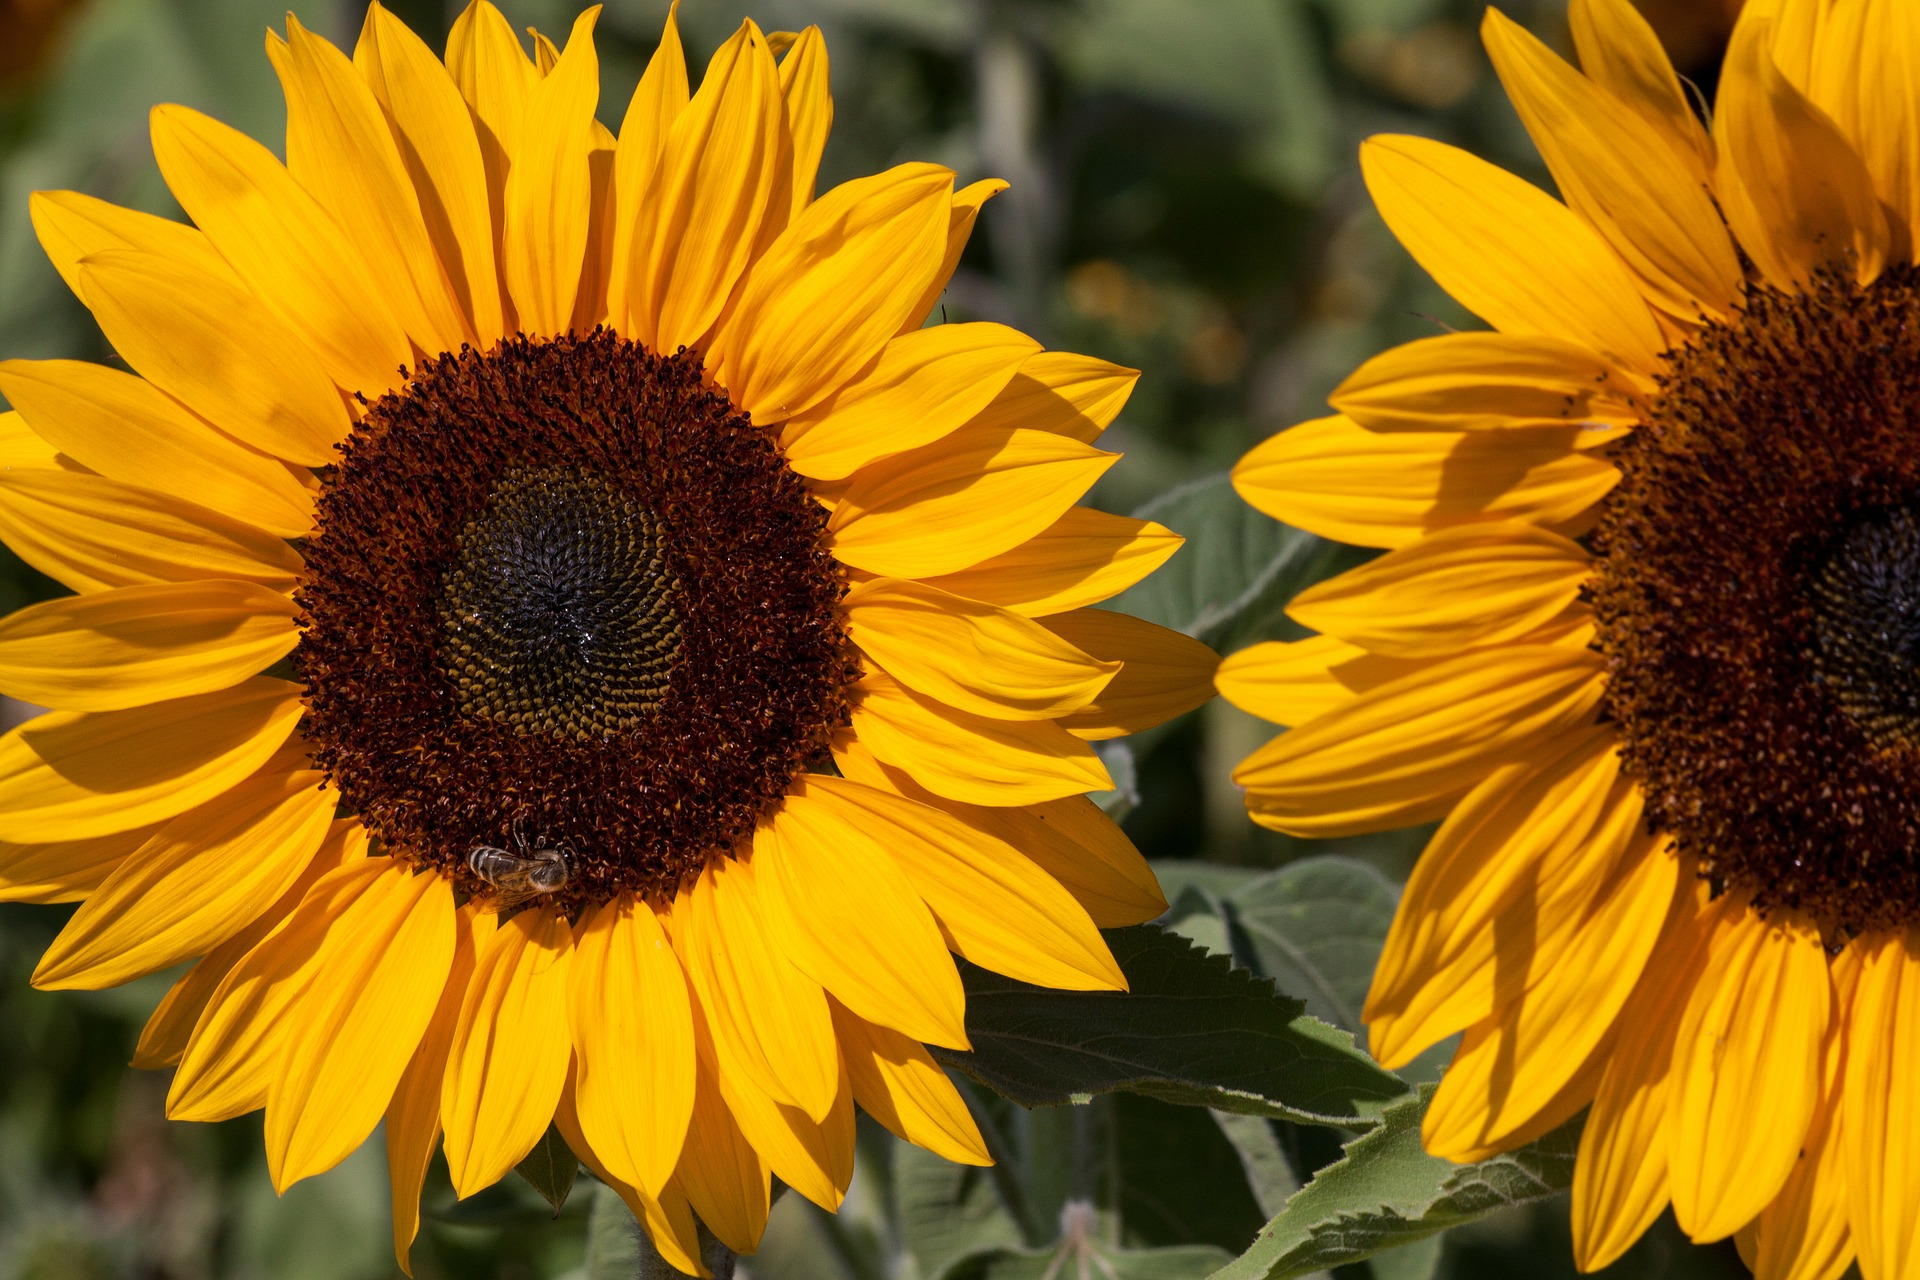 Sunflower Field, Seed, Nature, Sun, Sunflower, HQ Photo